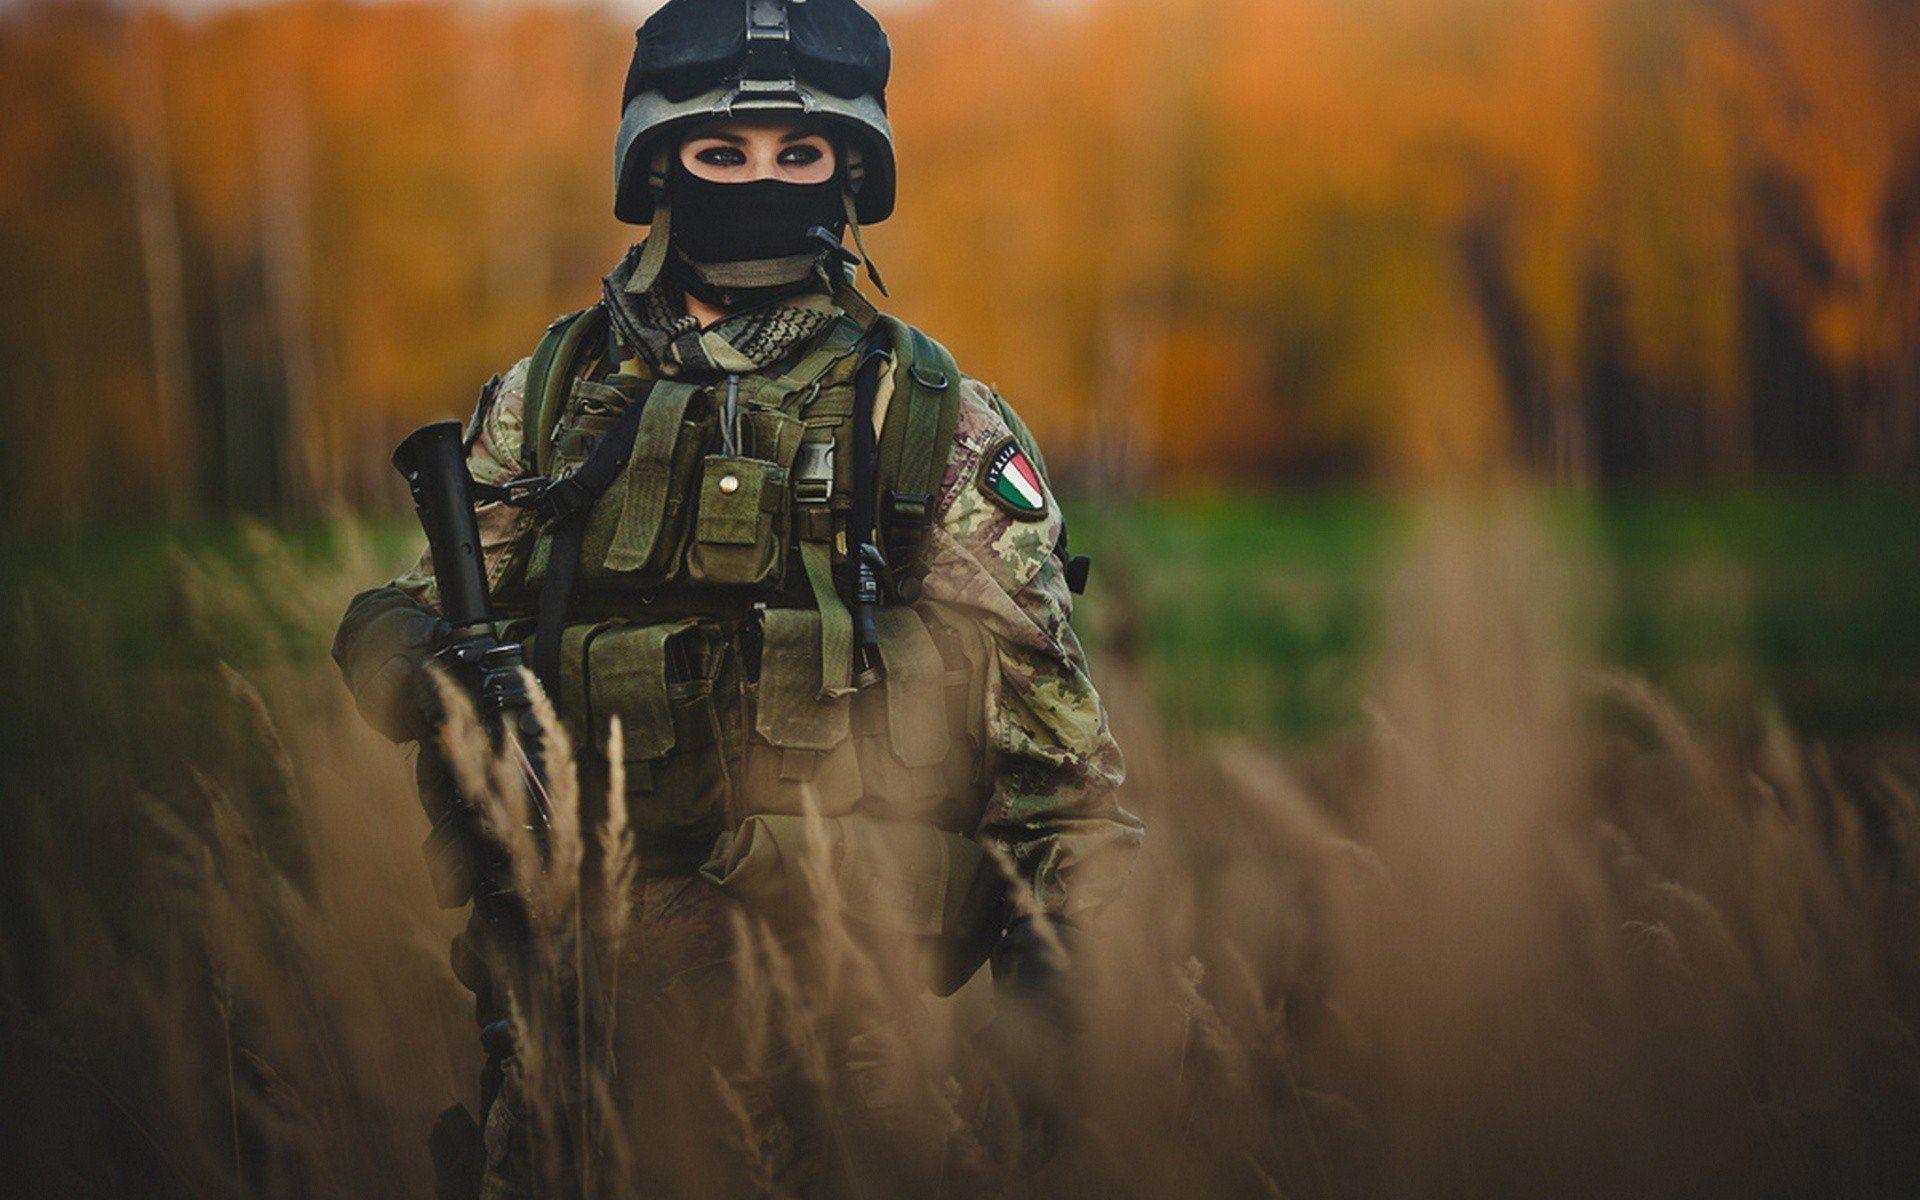 Italian Girl Soldier Army Hd Wallpaper Military Wallpaper Army Photography Military Women